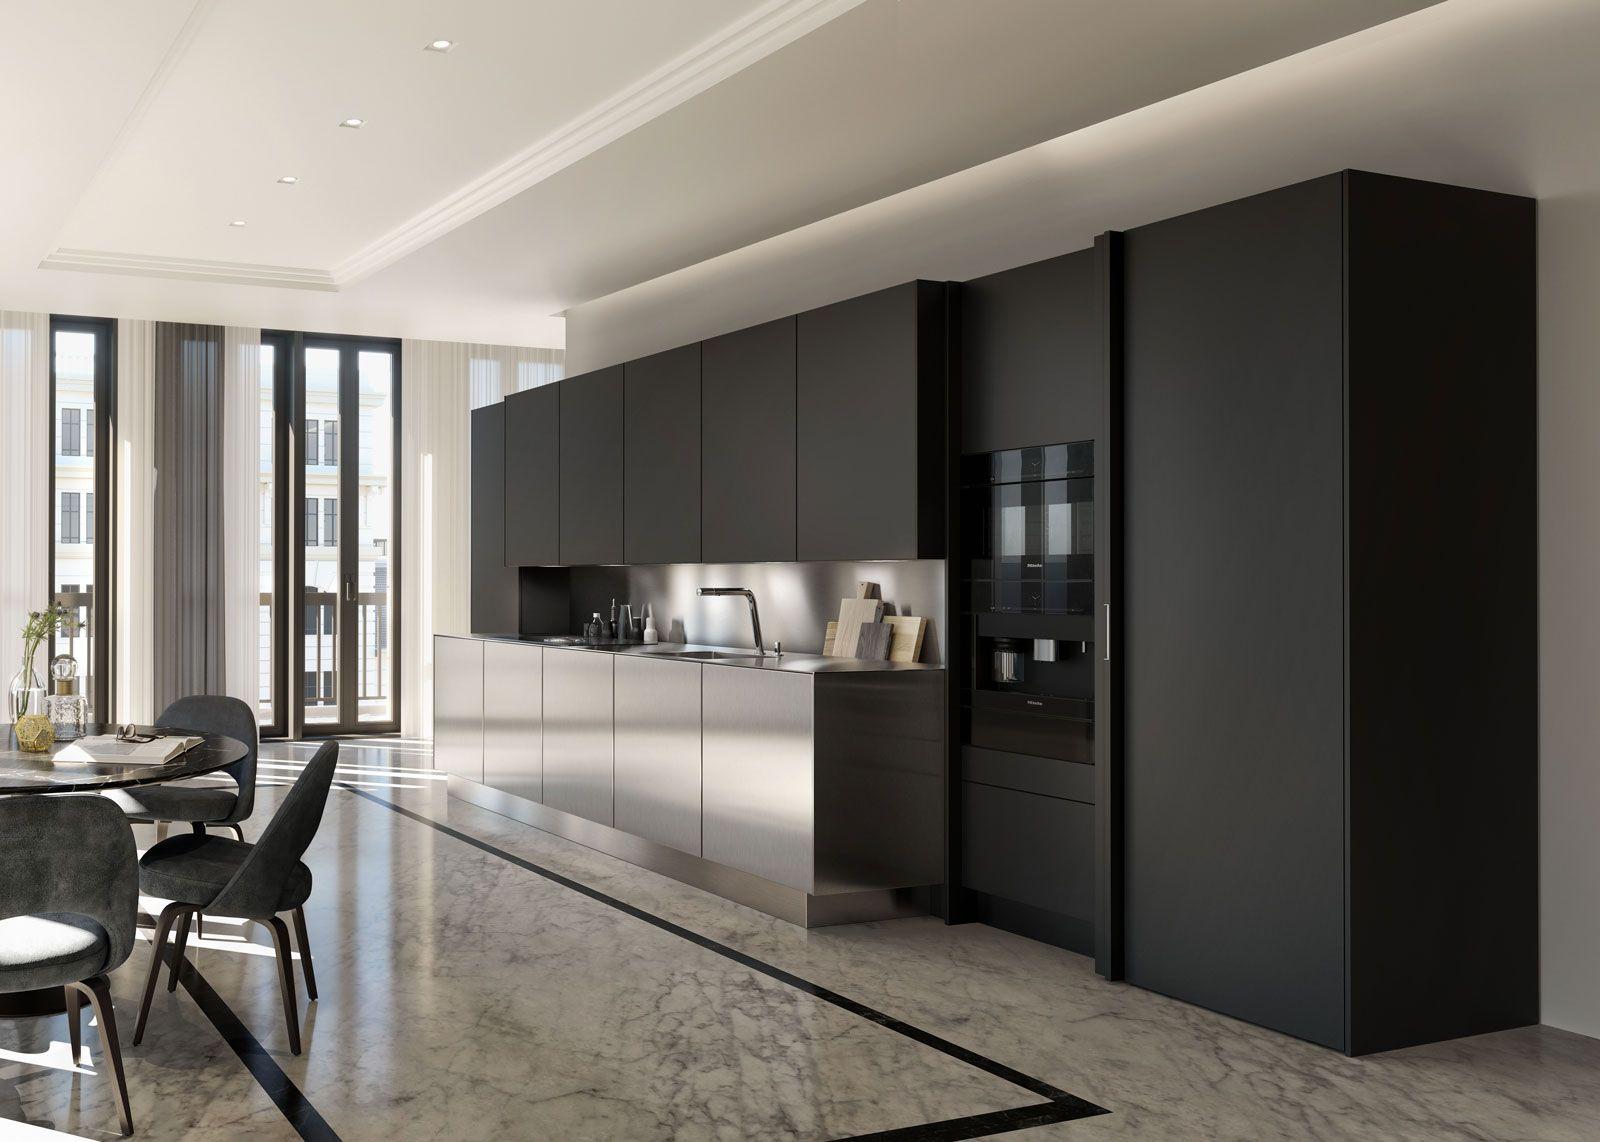 Cuisine Noire Et Inox De Luxe Siematic Design Cuisine D